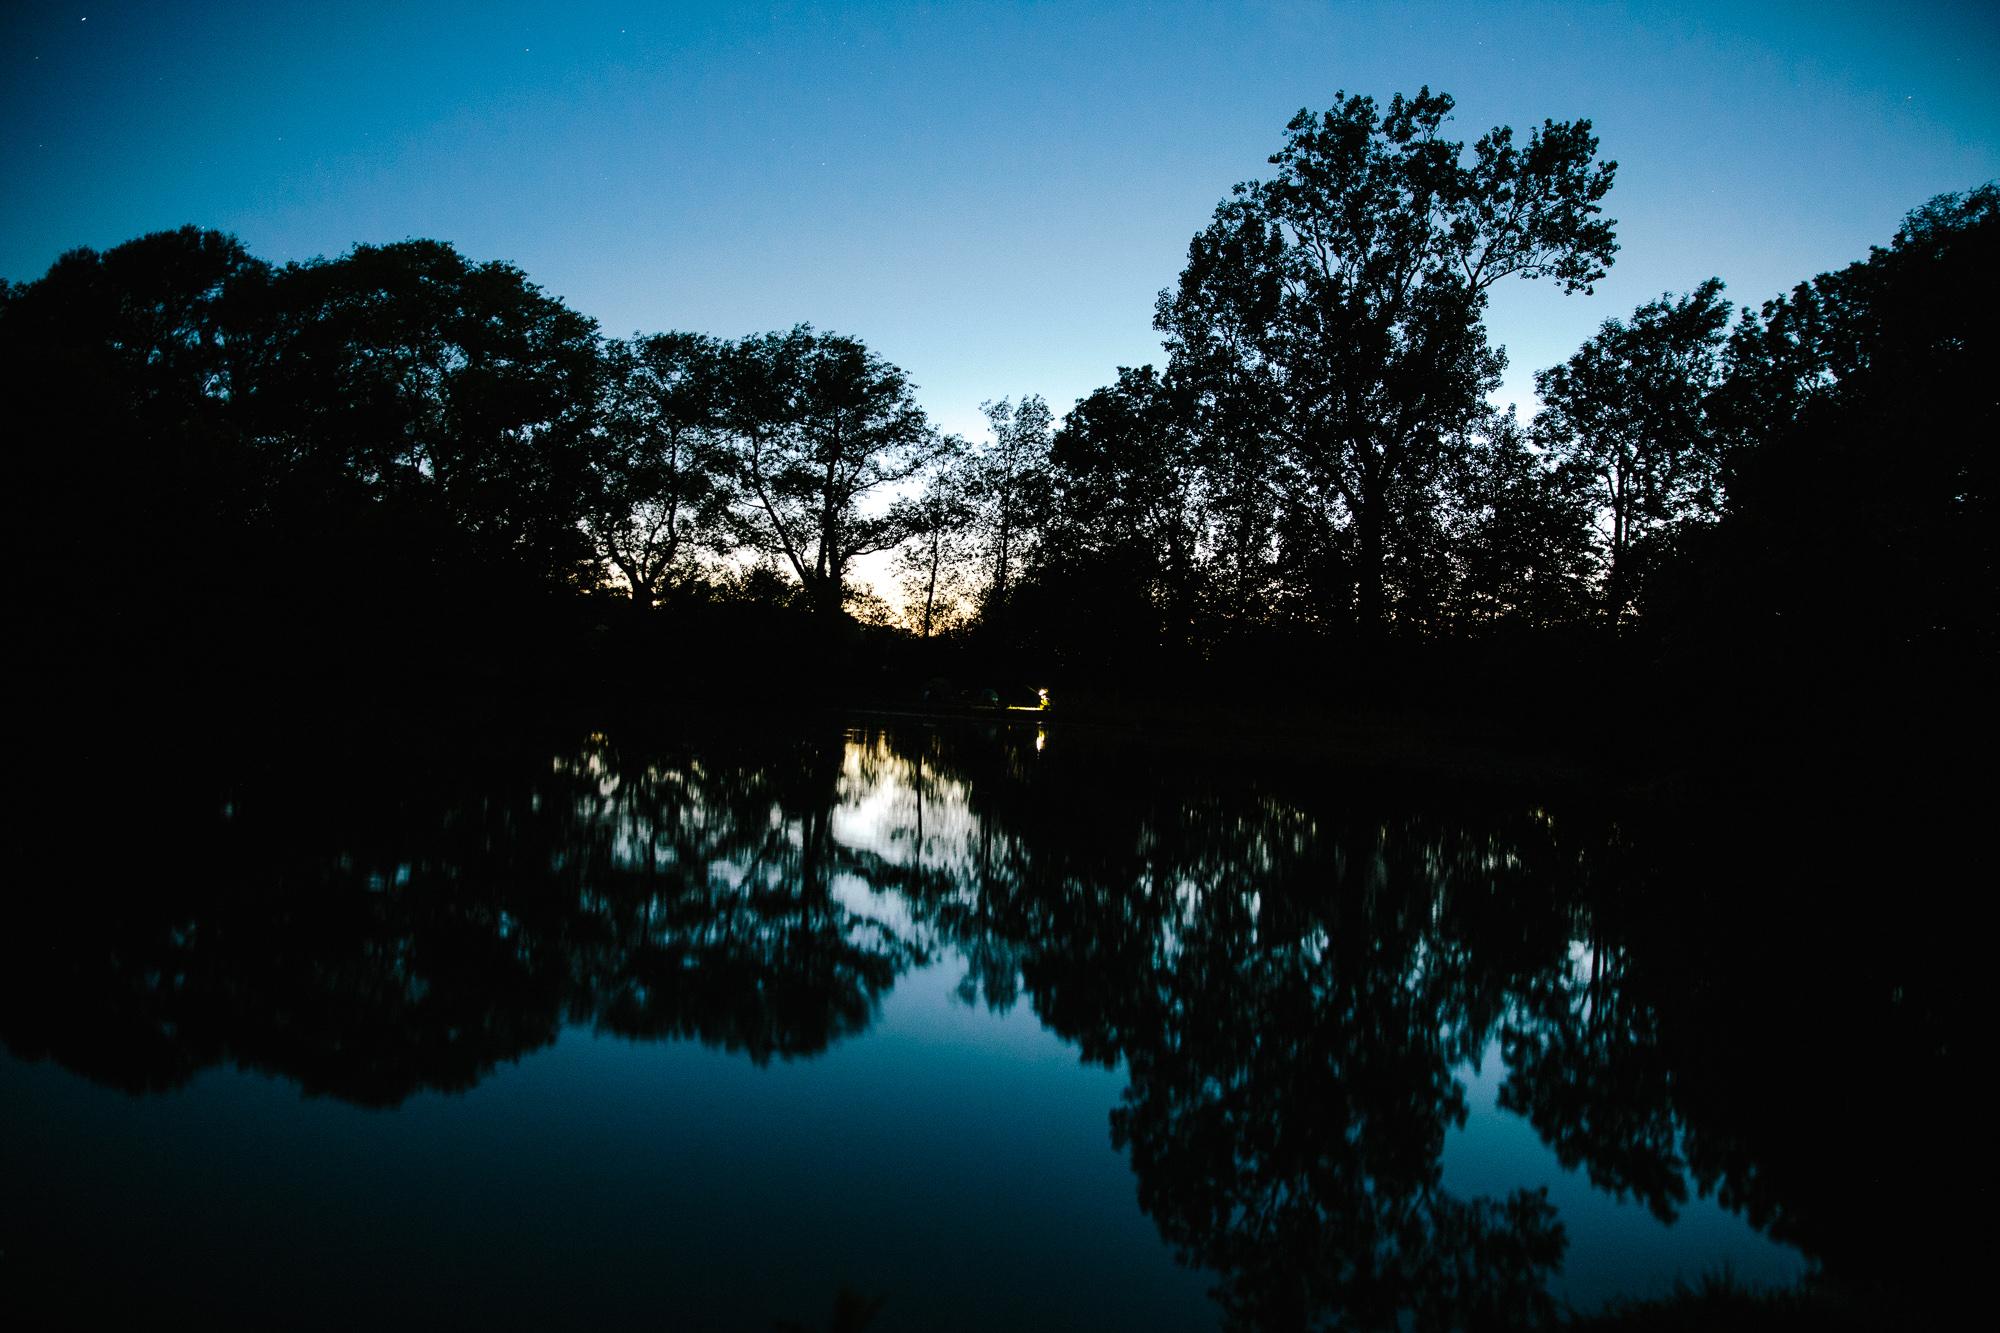 reflection lac pecheur